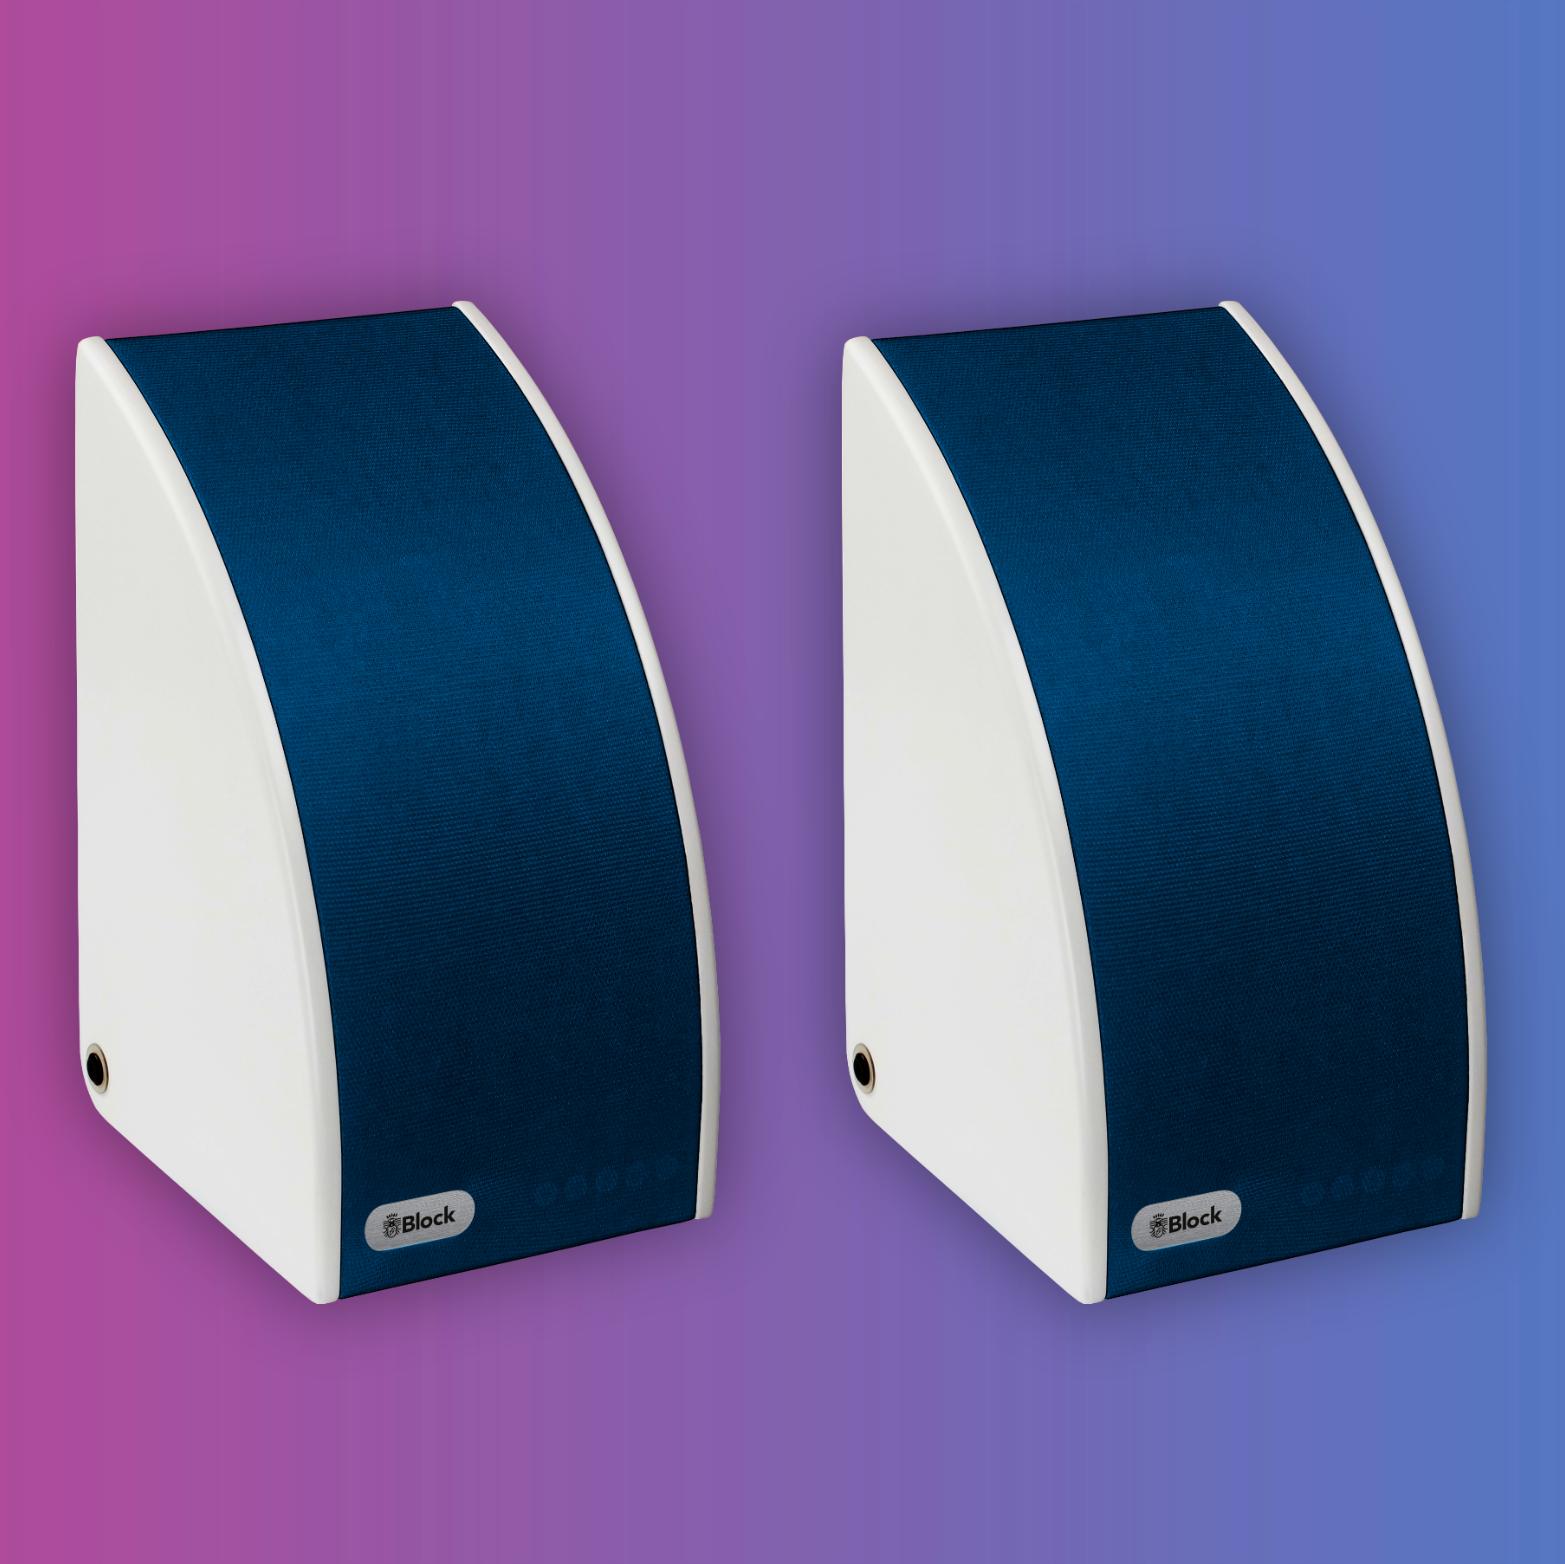 Block SB-100: Multiroom-Lautsprecher (Stückpreis, WiFi, UKW, DAB+) // SB-50 für 60,99€ statt 138€